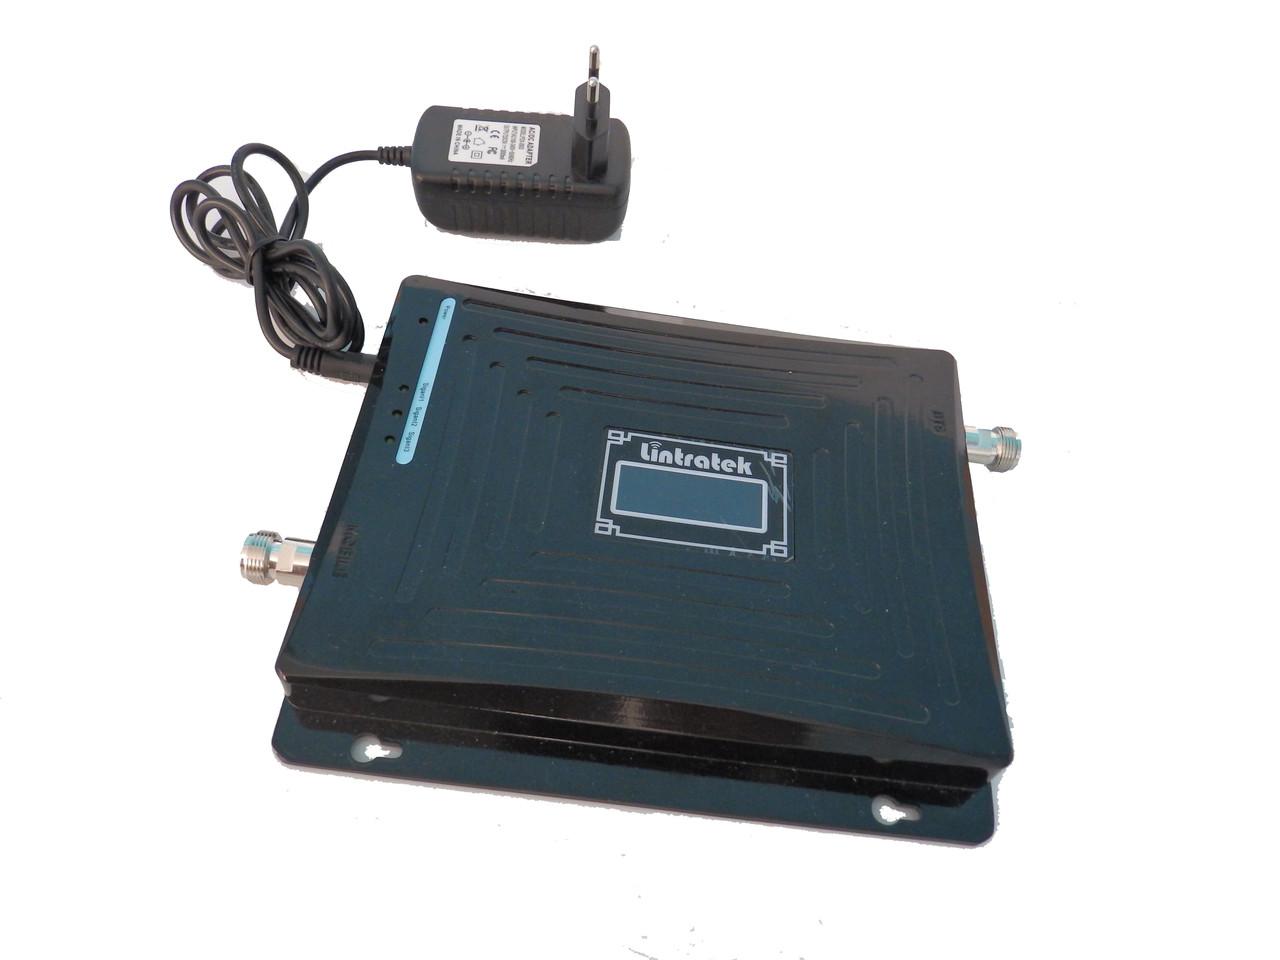 Усилитель 2G\3G\4G репитер, GSM 900 + 3G 2100 + 4G 1800 mhz  Lintratek KW19L-GDW - Оригинал 100%